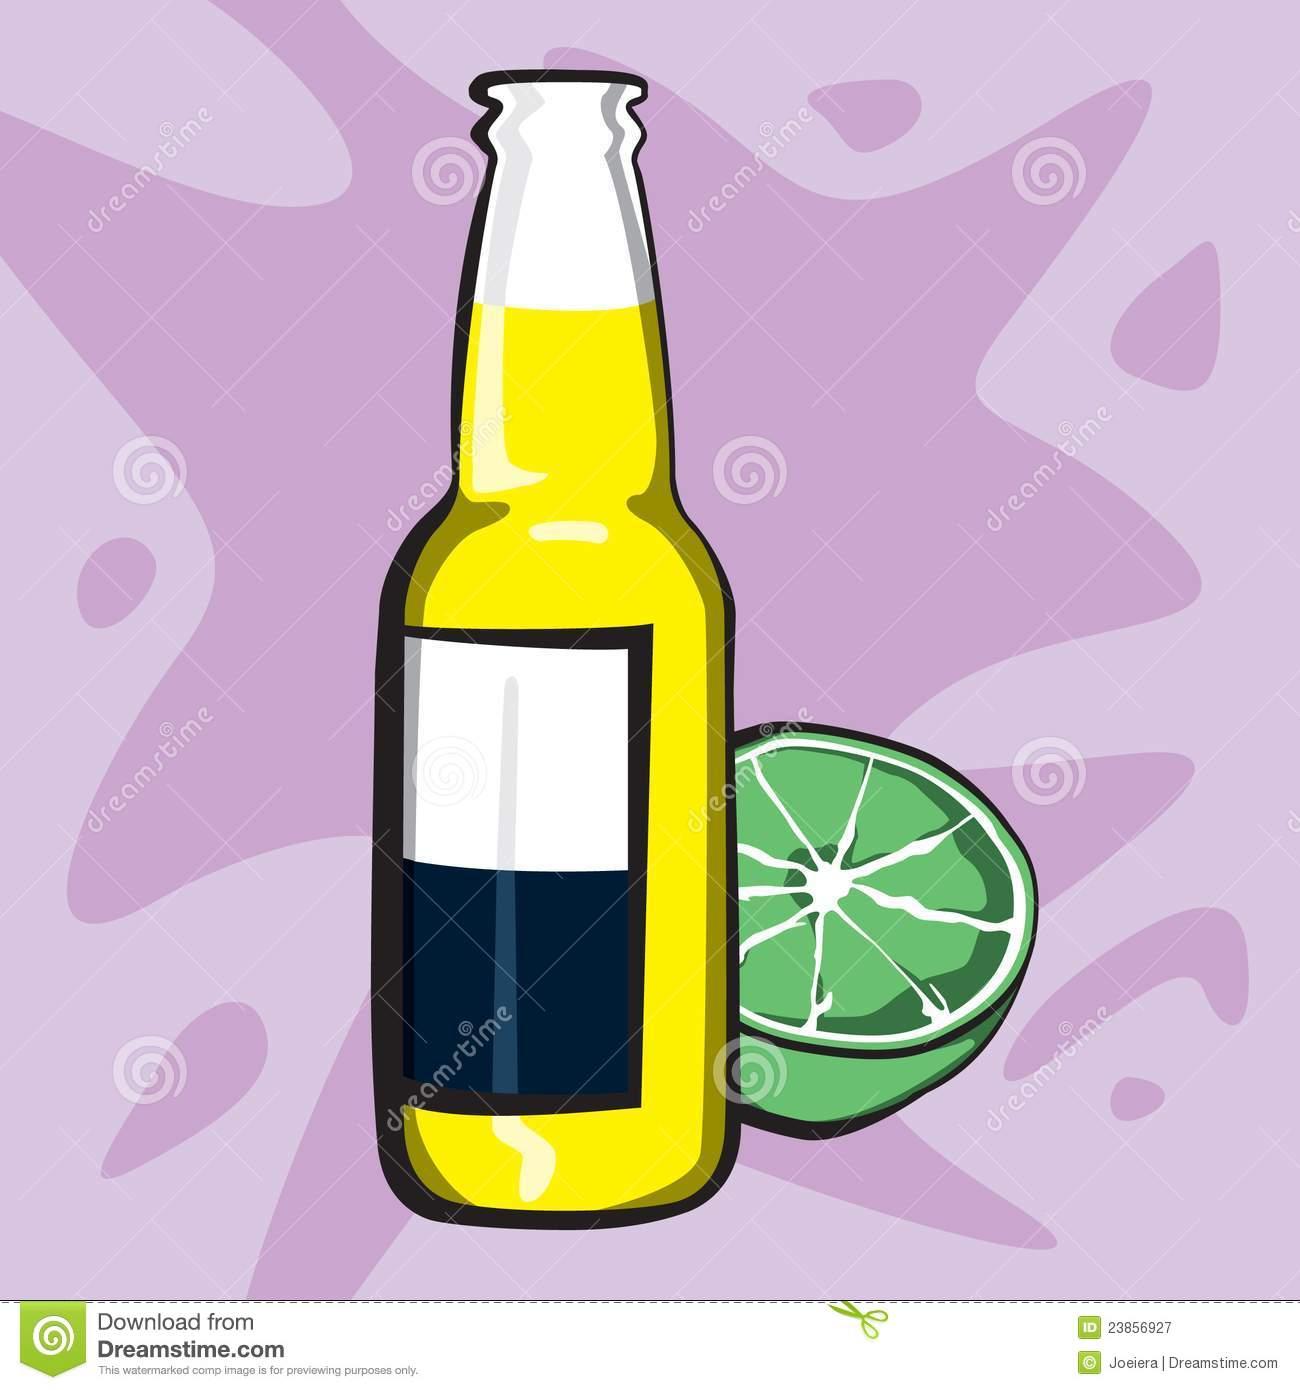 Corona clipart Cliparts Bottle Corona Corona Clipart